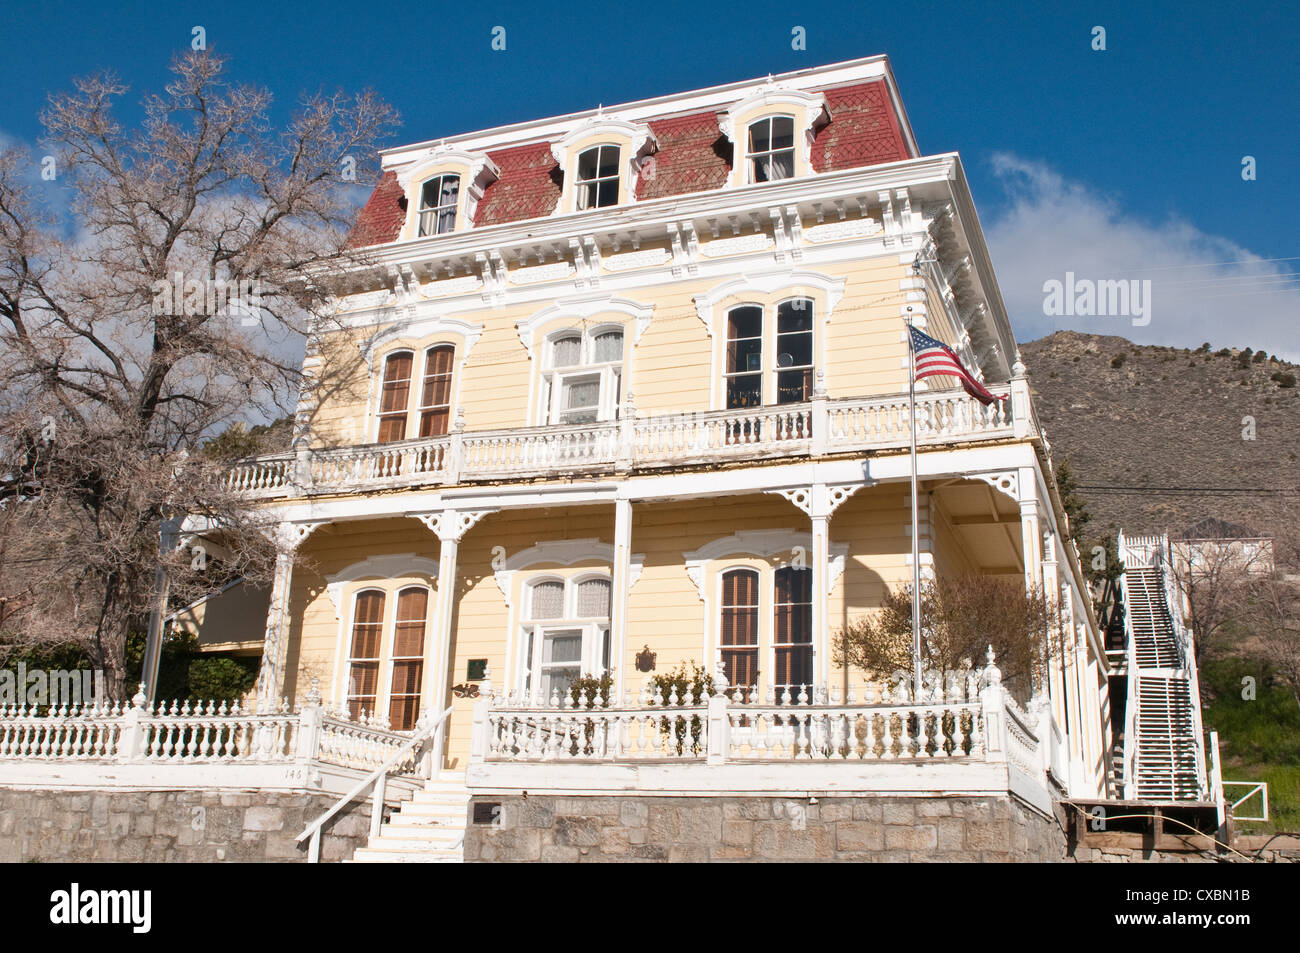 Savage Mansion dating from around 1861, Virginia City, Nevada, United States of America, North America - Stock Image